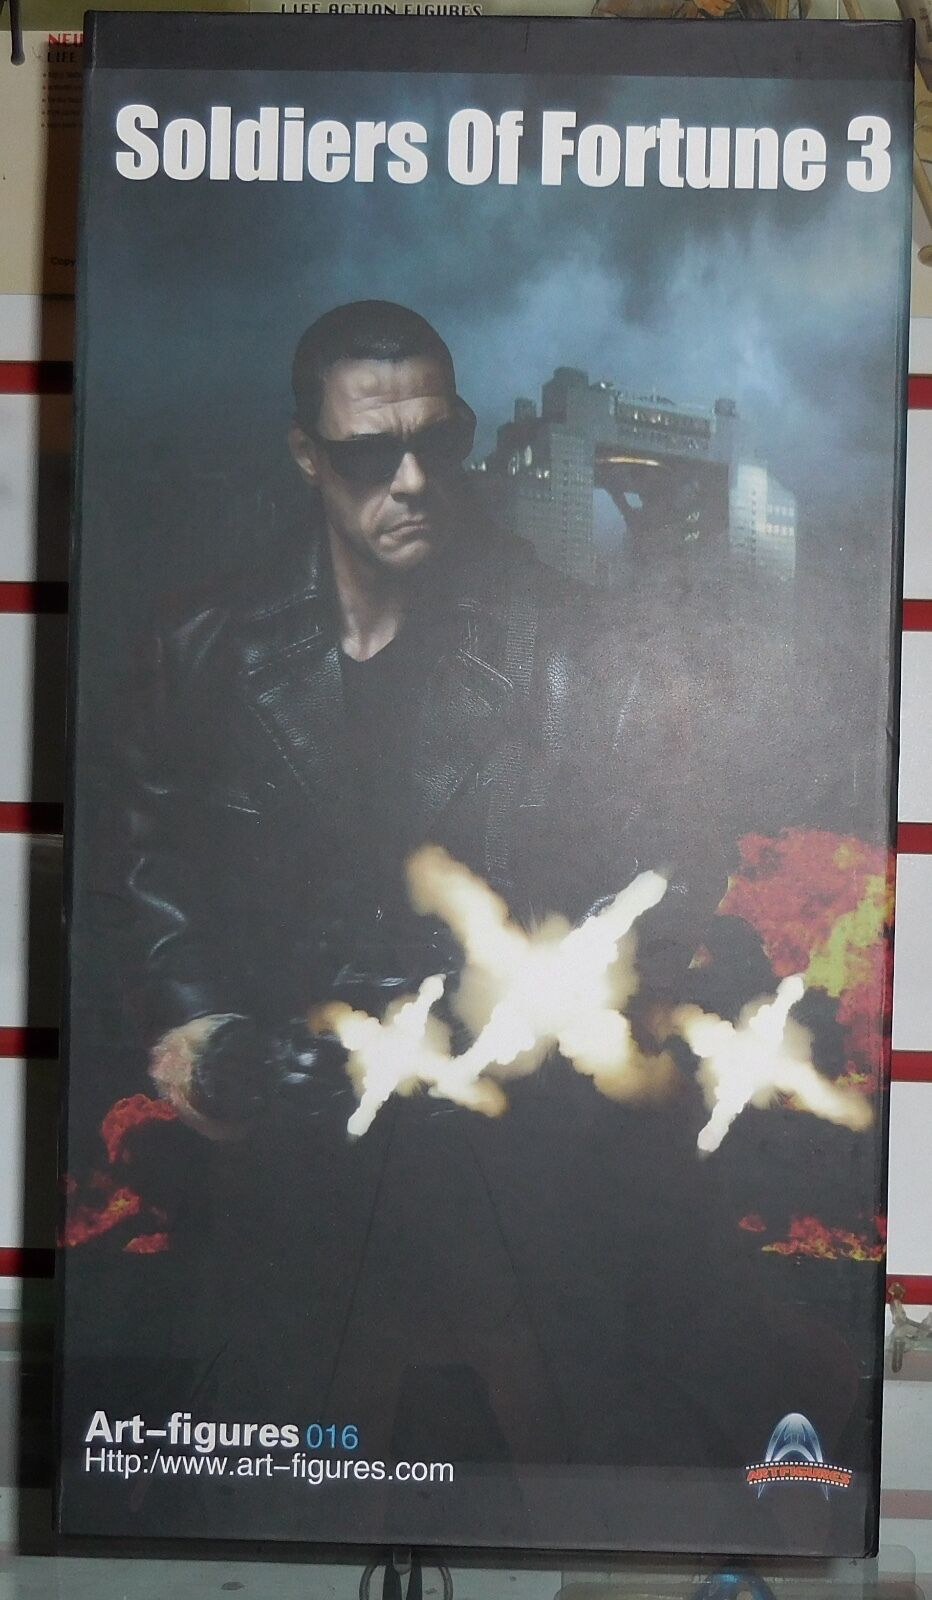 ART FIGURES SOLDIER OF FORTUNE 3 Van Damme BOX FIGURE 1 6 ACTION FIGURE TOYS dam